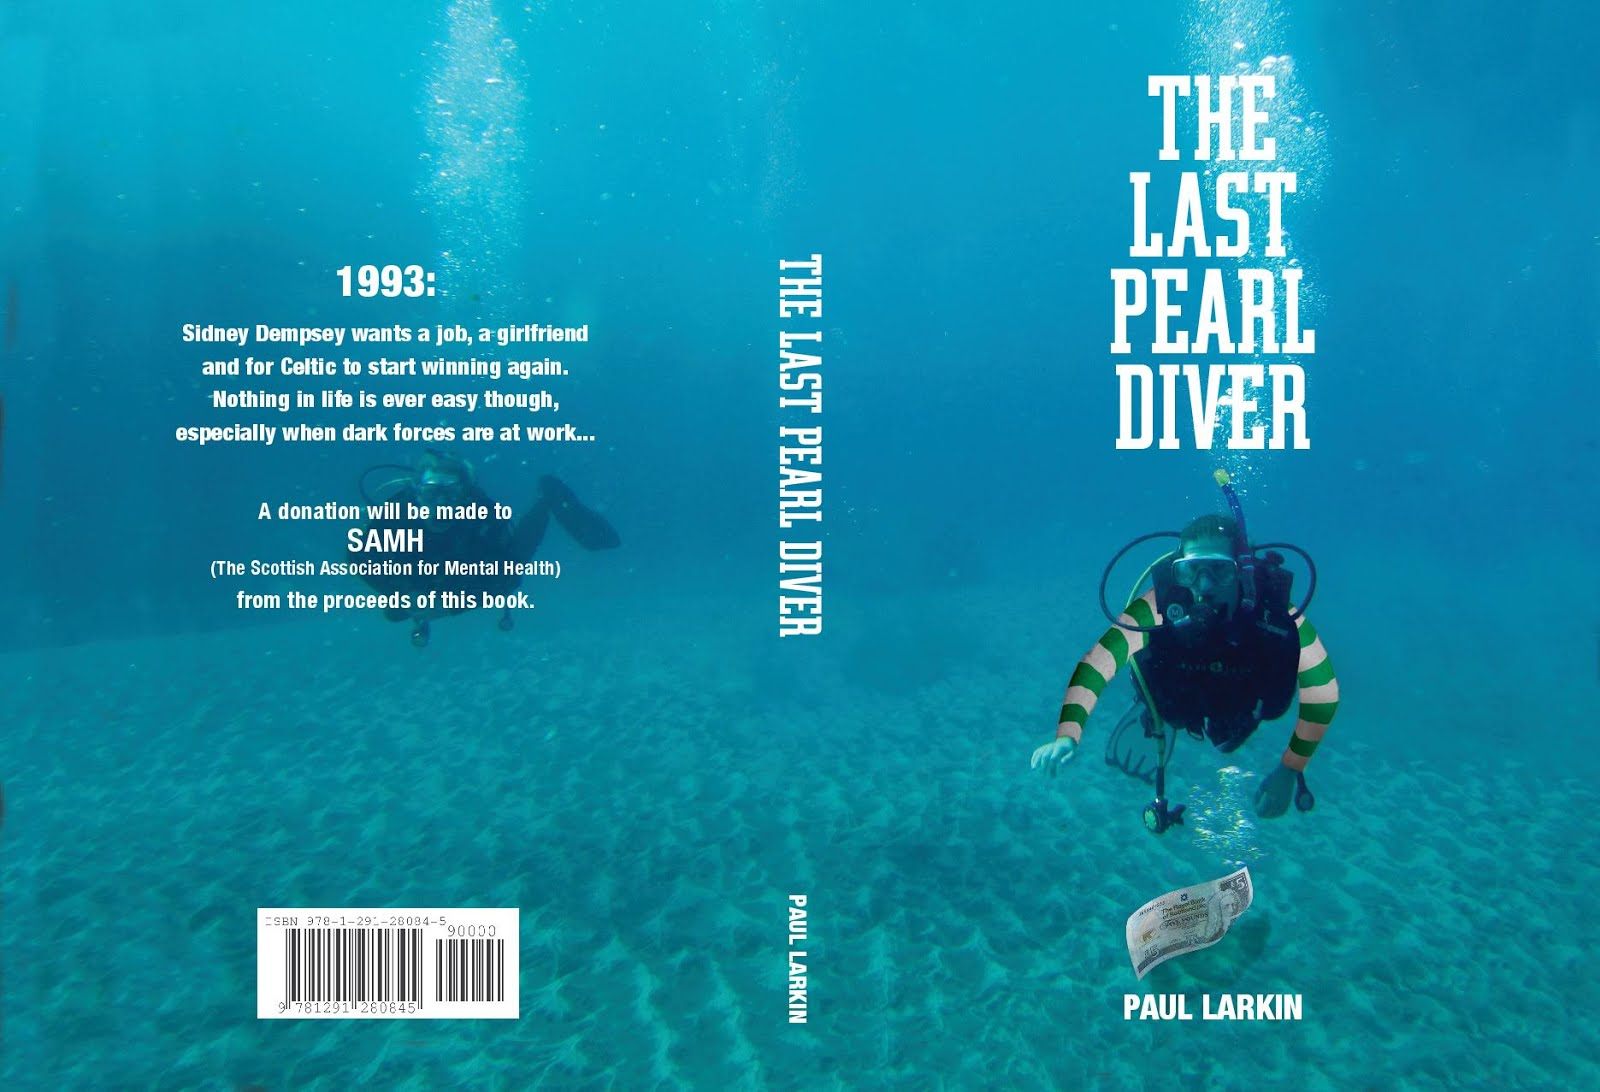 The Last Pearl Diver